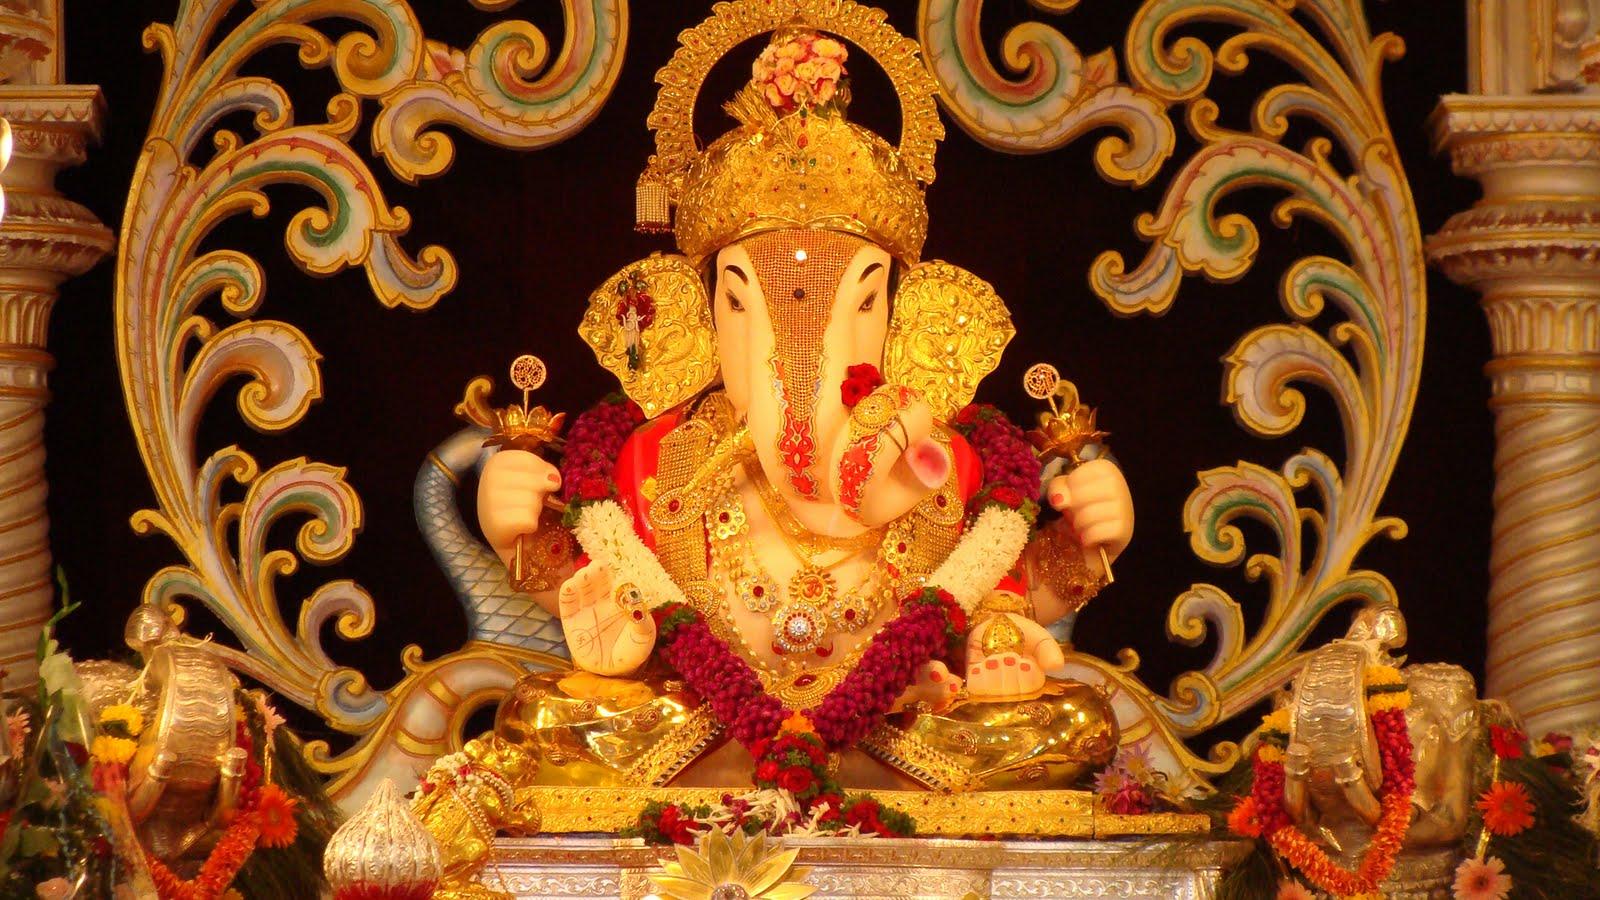 ganpati bappa morya story of lord ganesha my thought waves